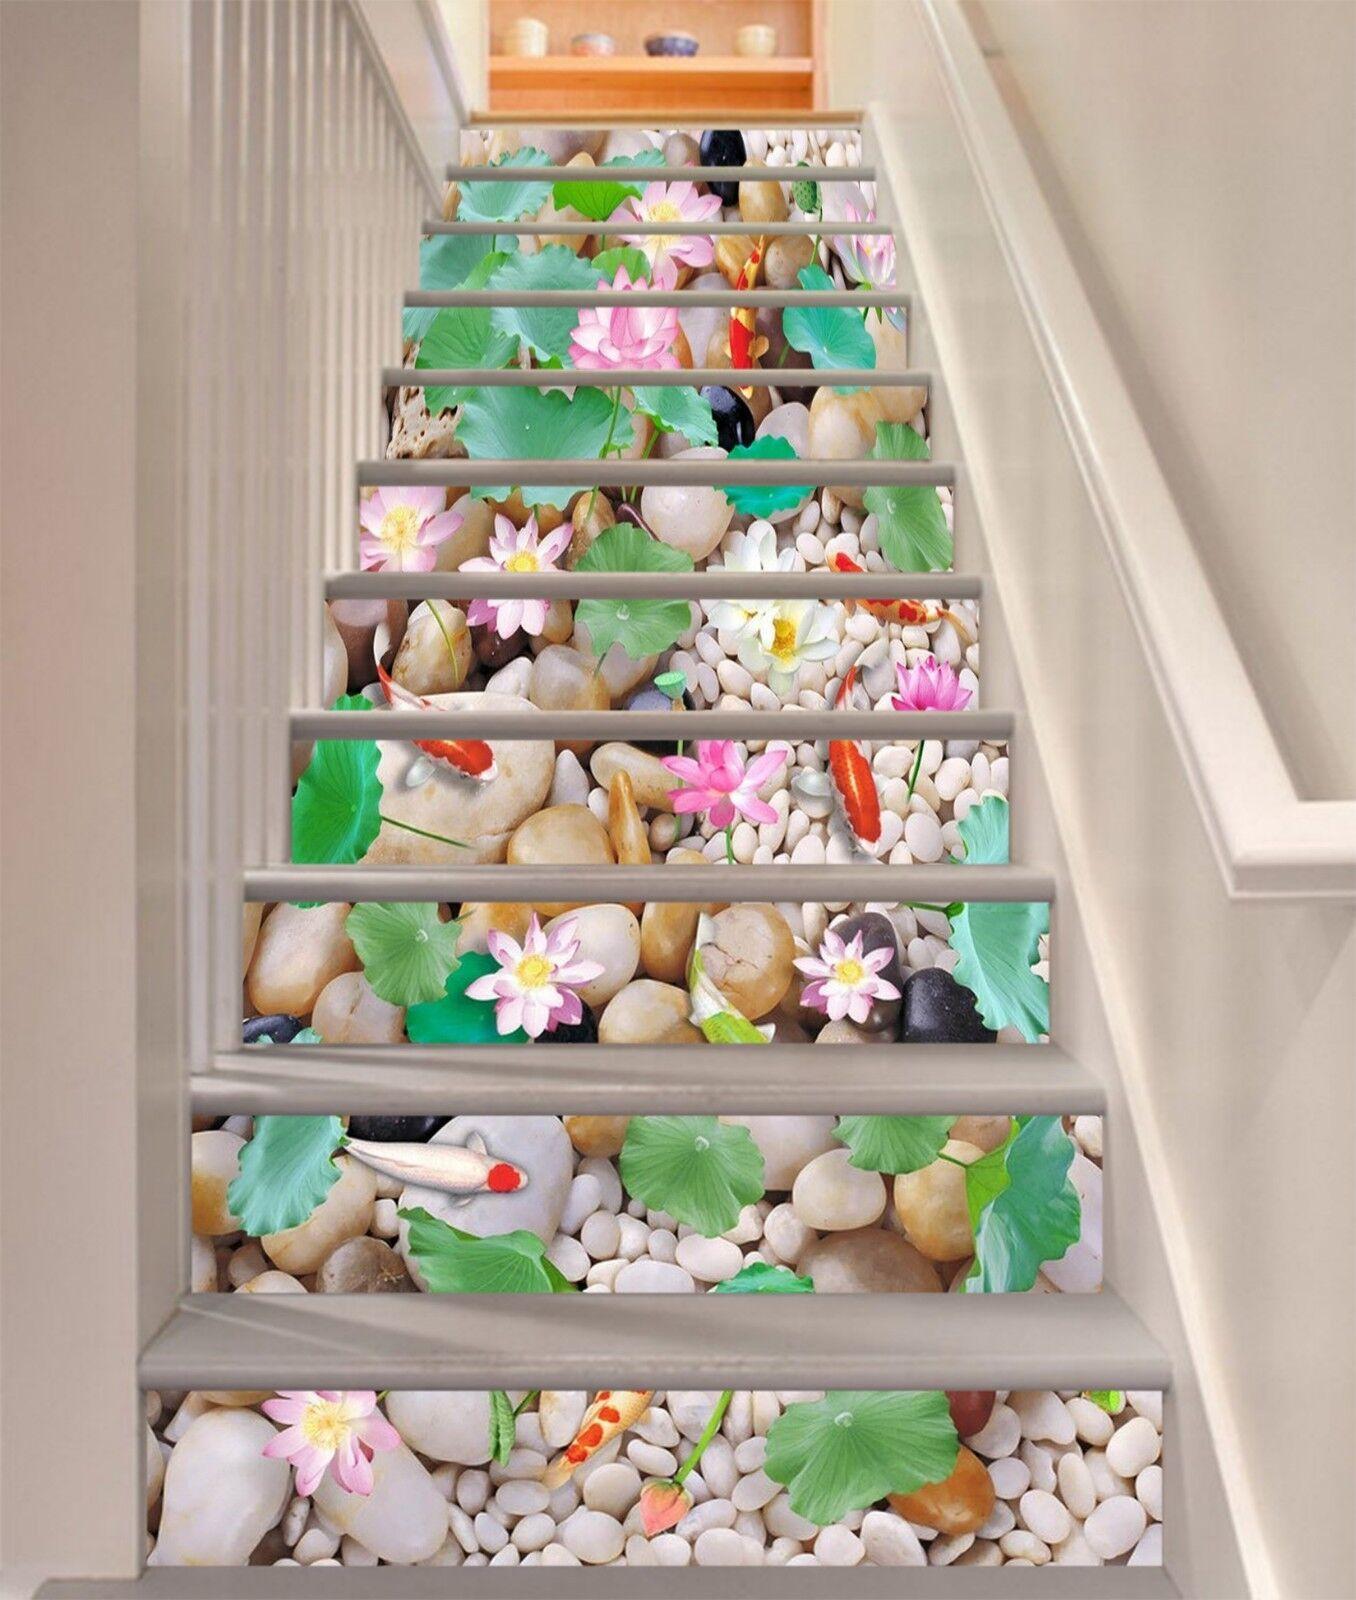 3D Cobble Carp Stair Risers Decoration Photo Mural Vinyl Decal Wallpaper CA